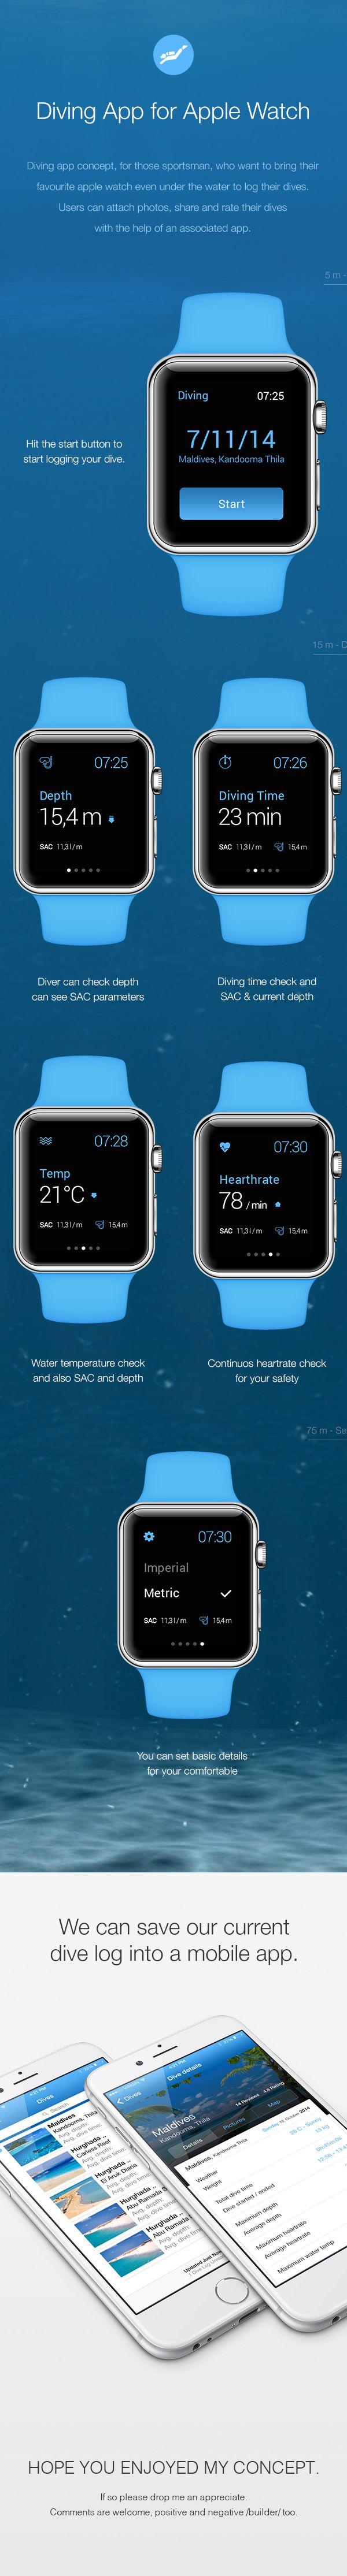 Apple watch diving app on Behance